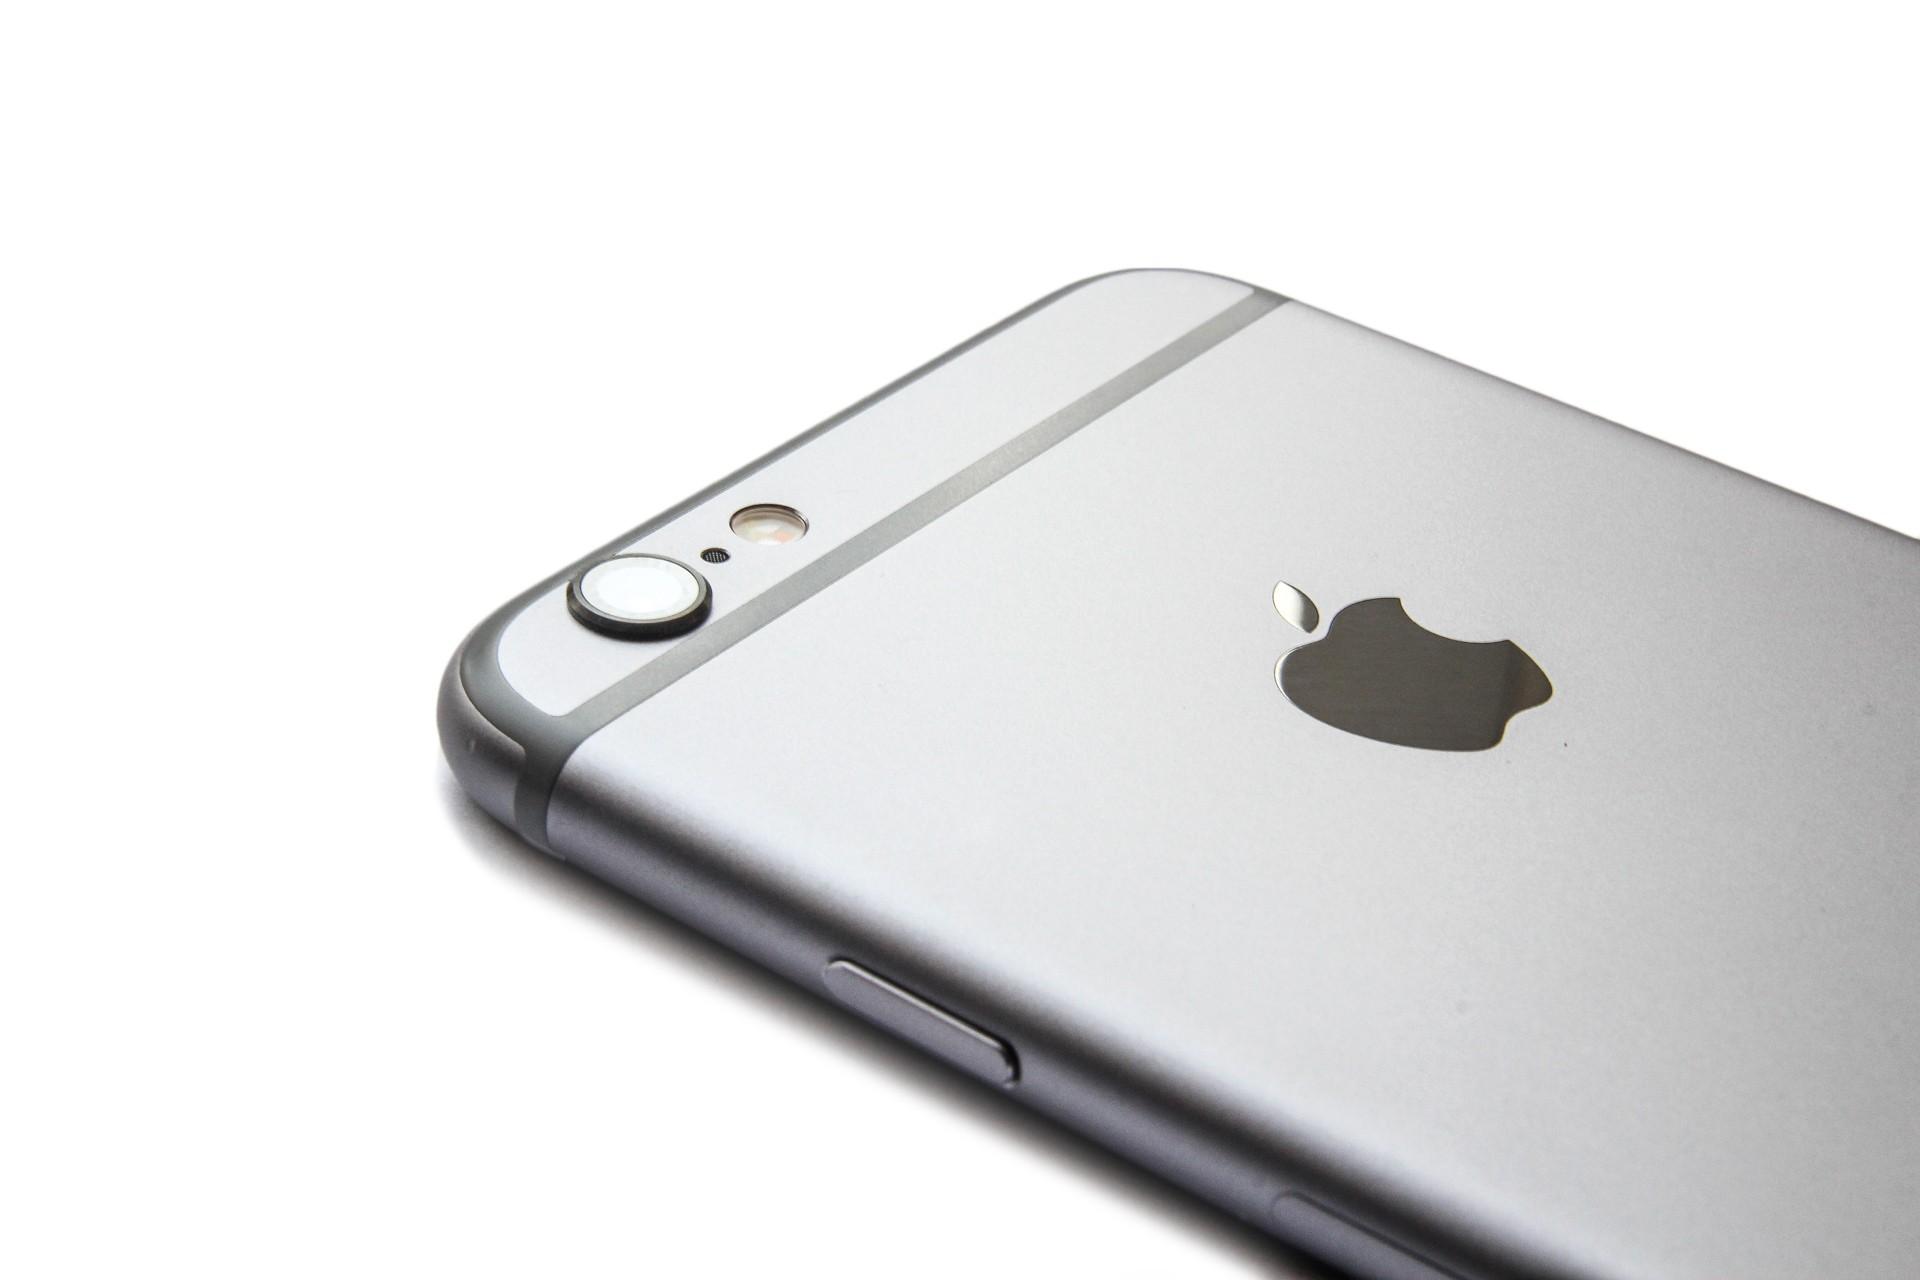 IPhone 6c получит 2 гигабайта оперативной памяти